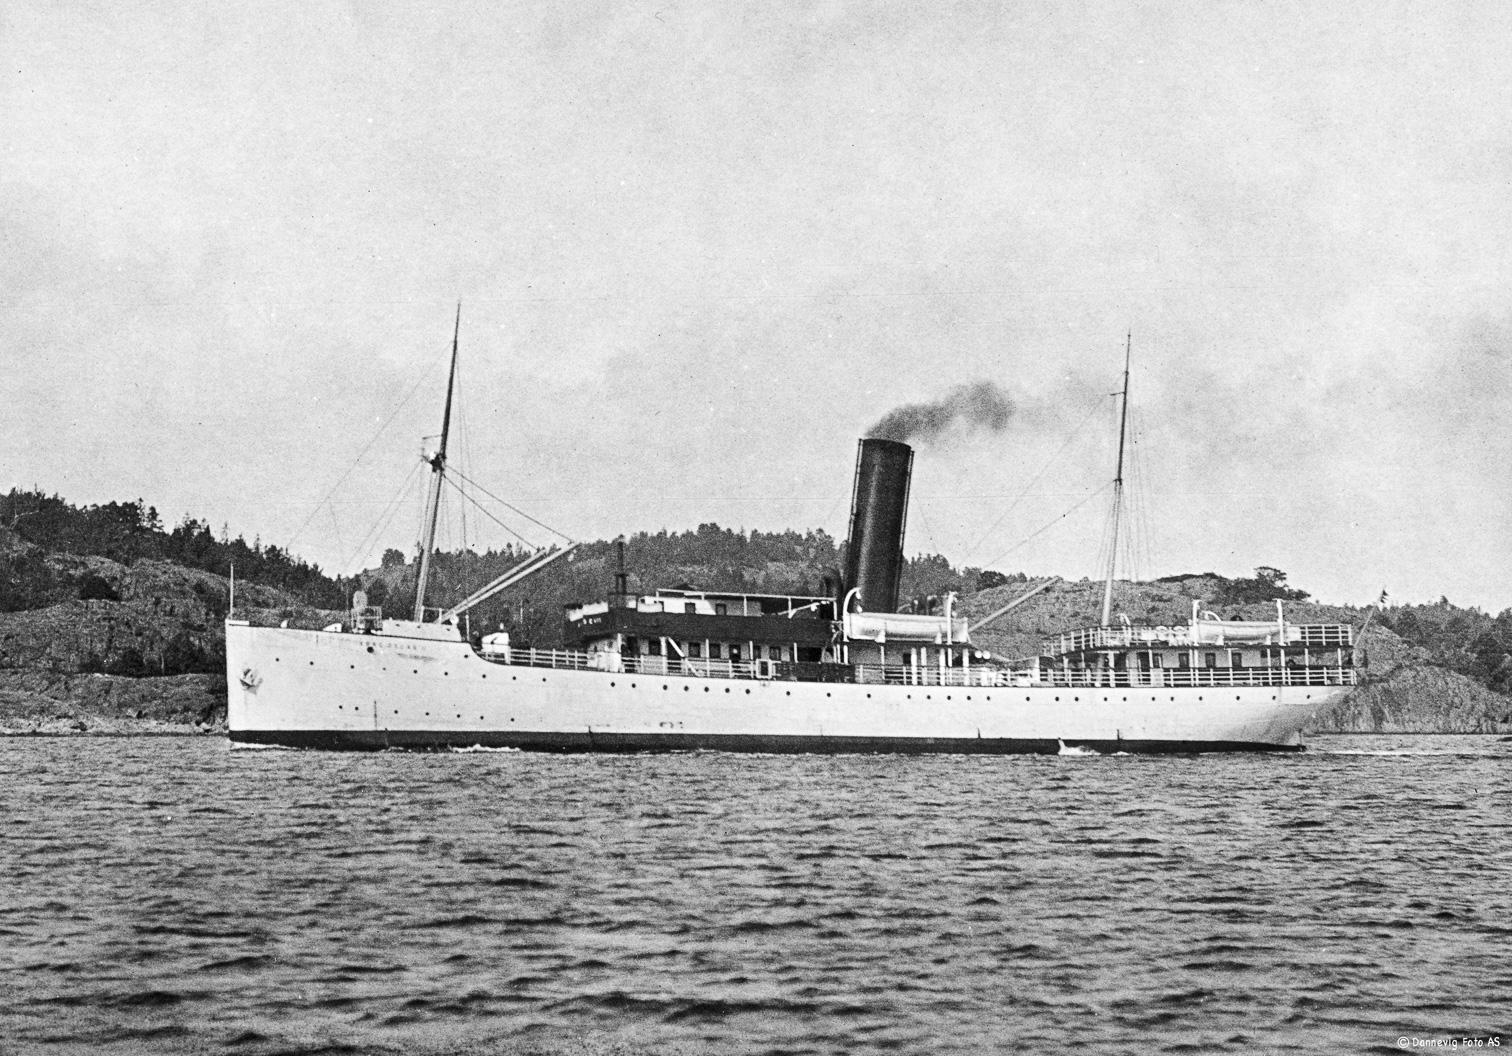 SS Kong Oscar II